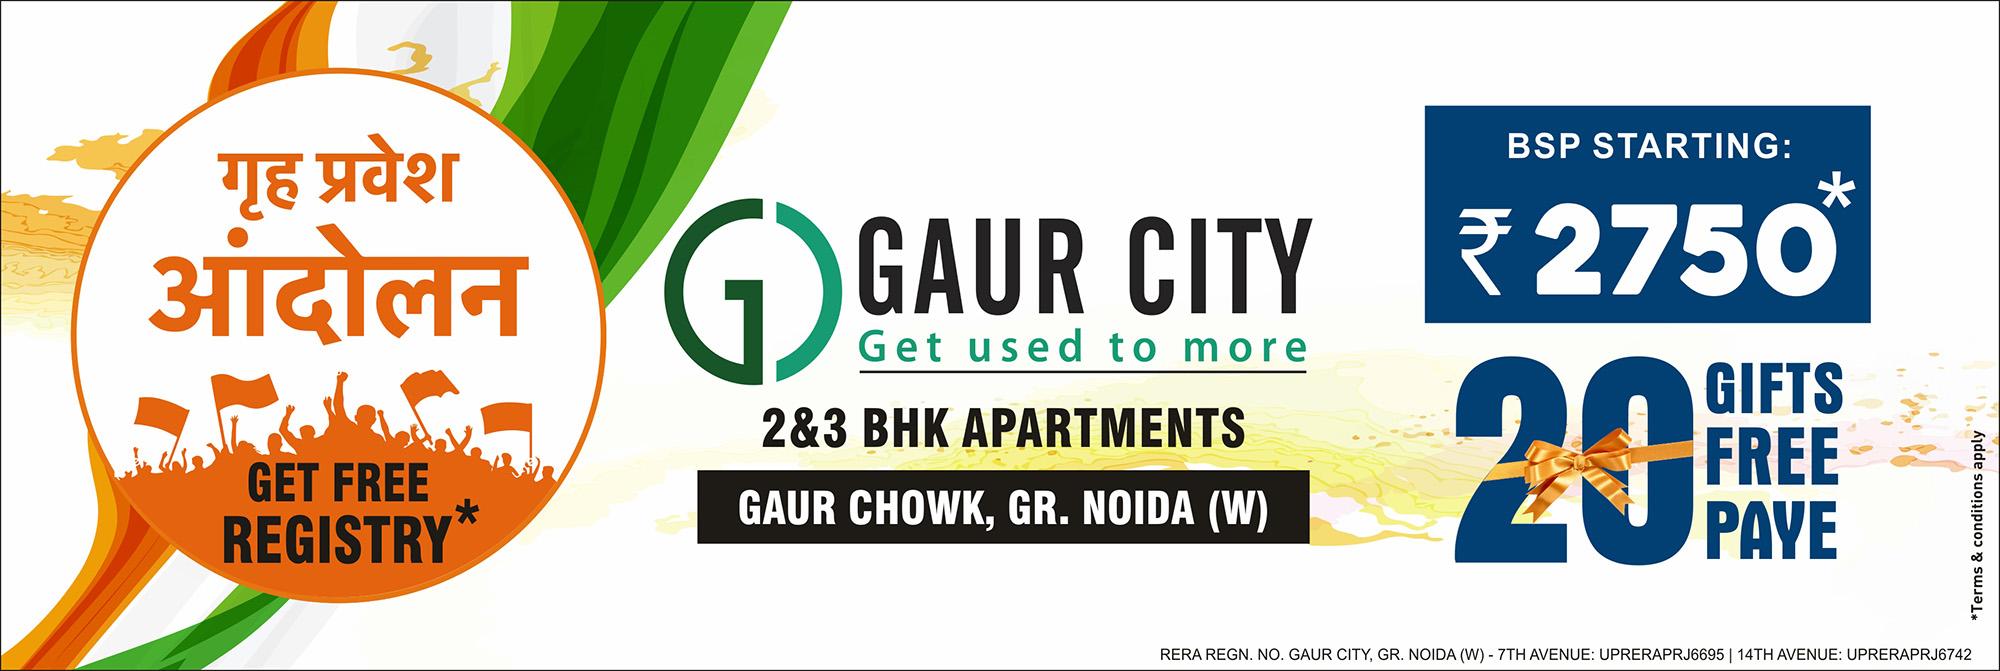 Gaur City Greater Noida West (Noida Extension), Reviews